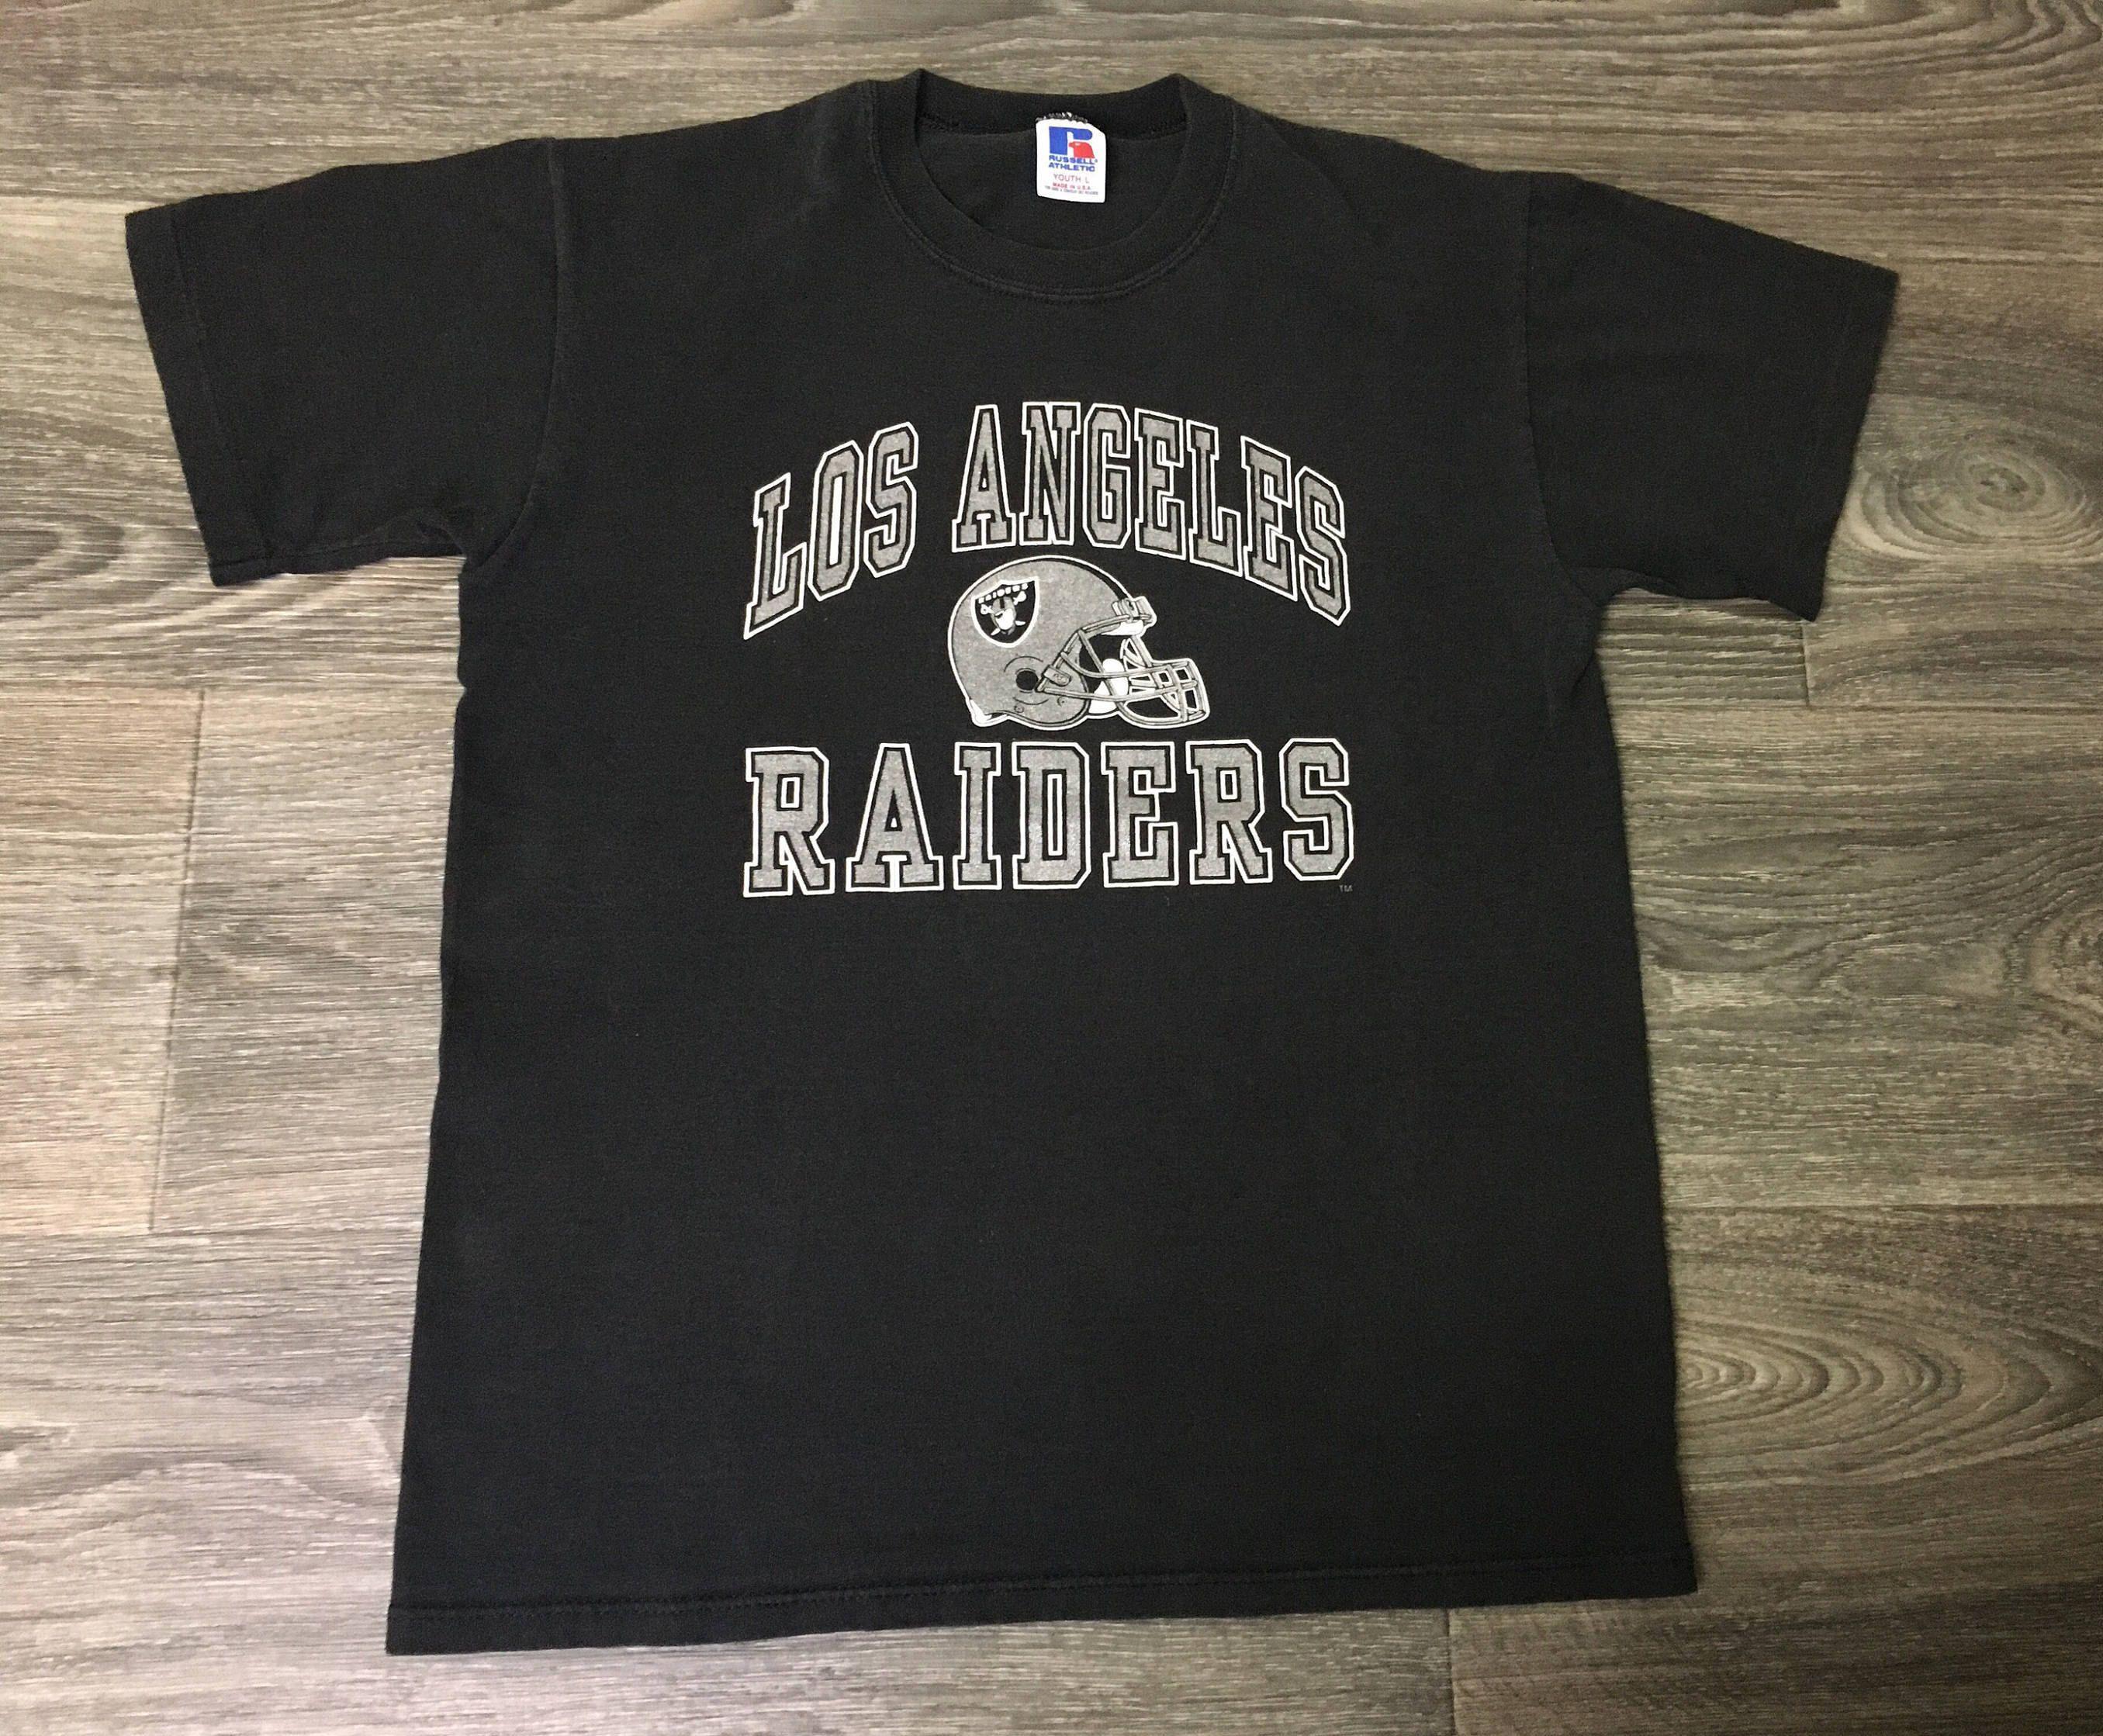 Raiders Shirt 80 S Vintage Los Angeles La Oakland Super Soft Tshirt Football Usa Made Nfl Youth Large Women S Small Raiders Shirt Football Usa Vintage Sports